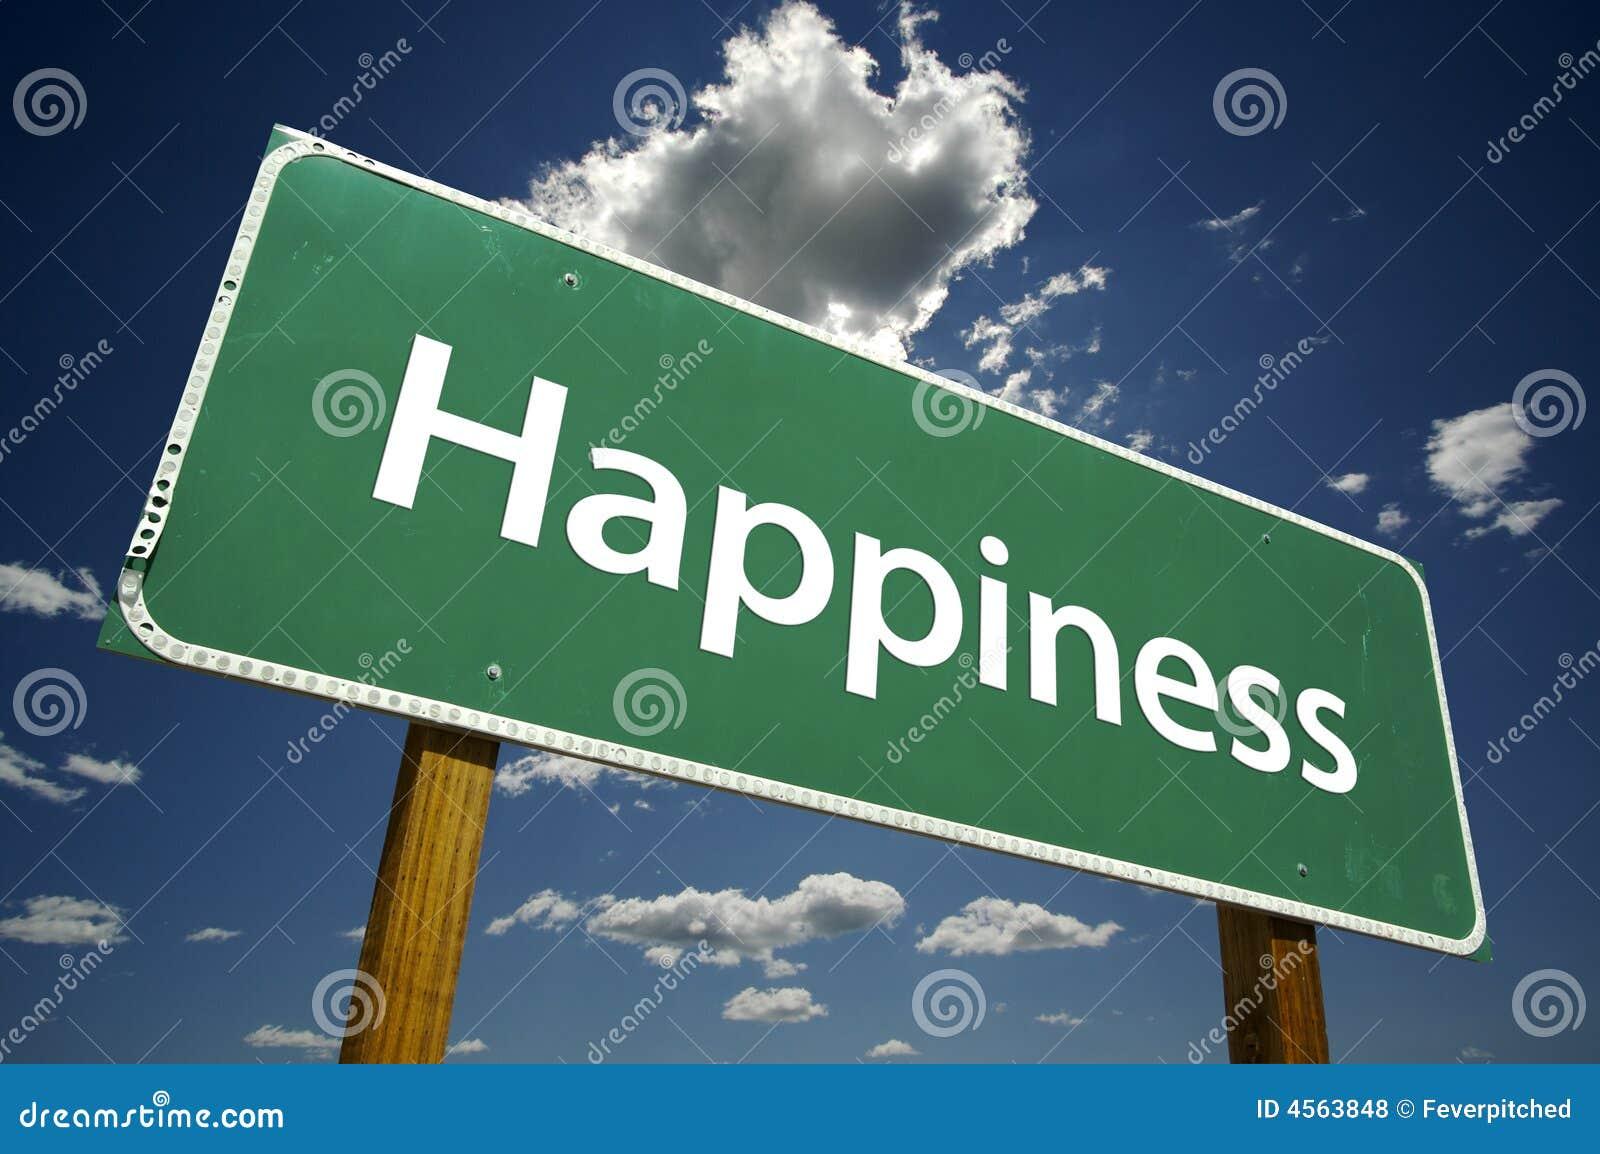 Felicidade - sinal de estrada